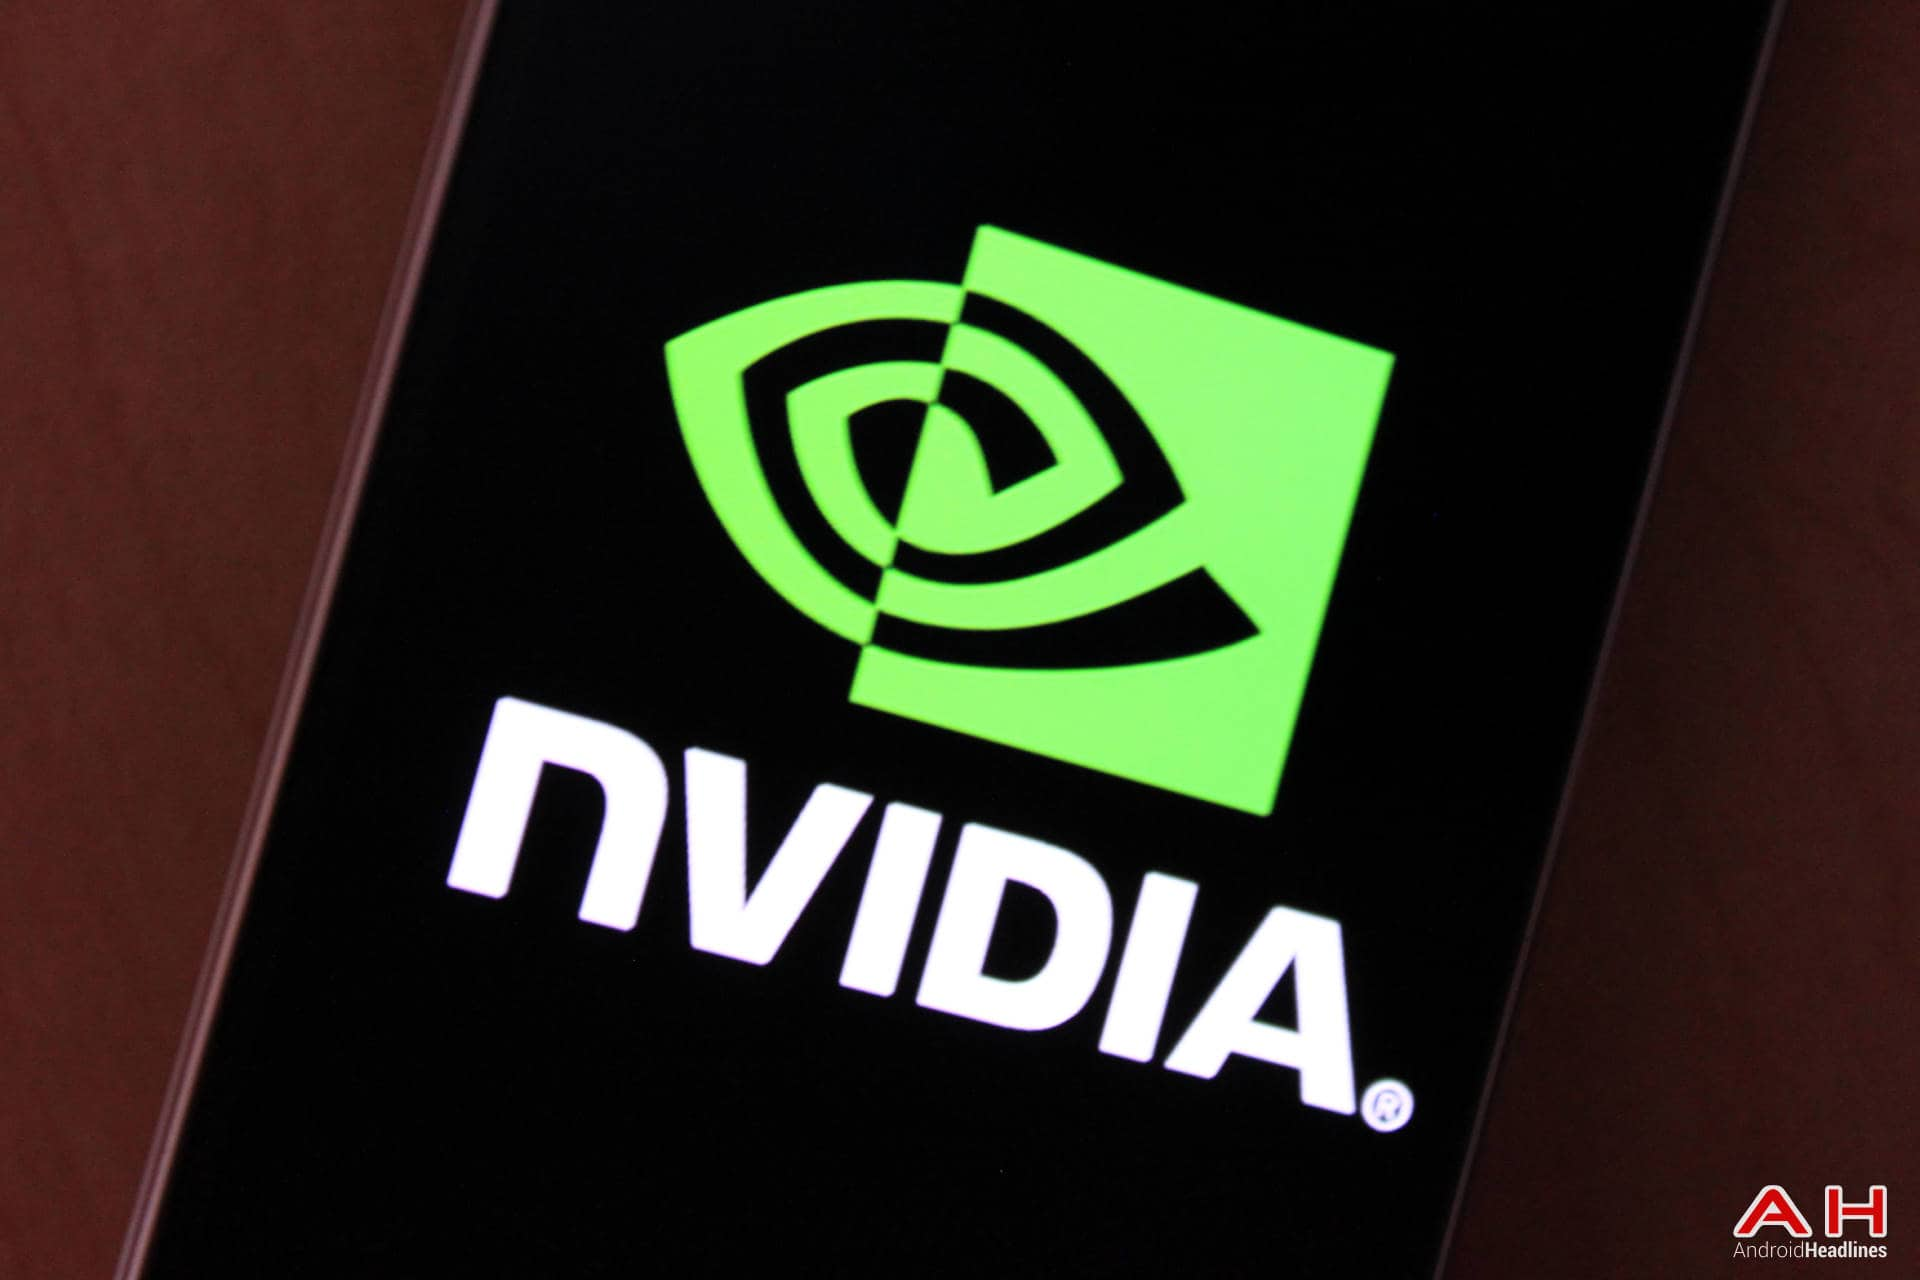 AH NVIDIA Logo 1.31